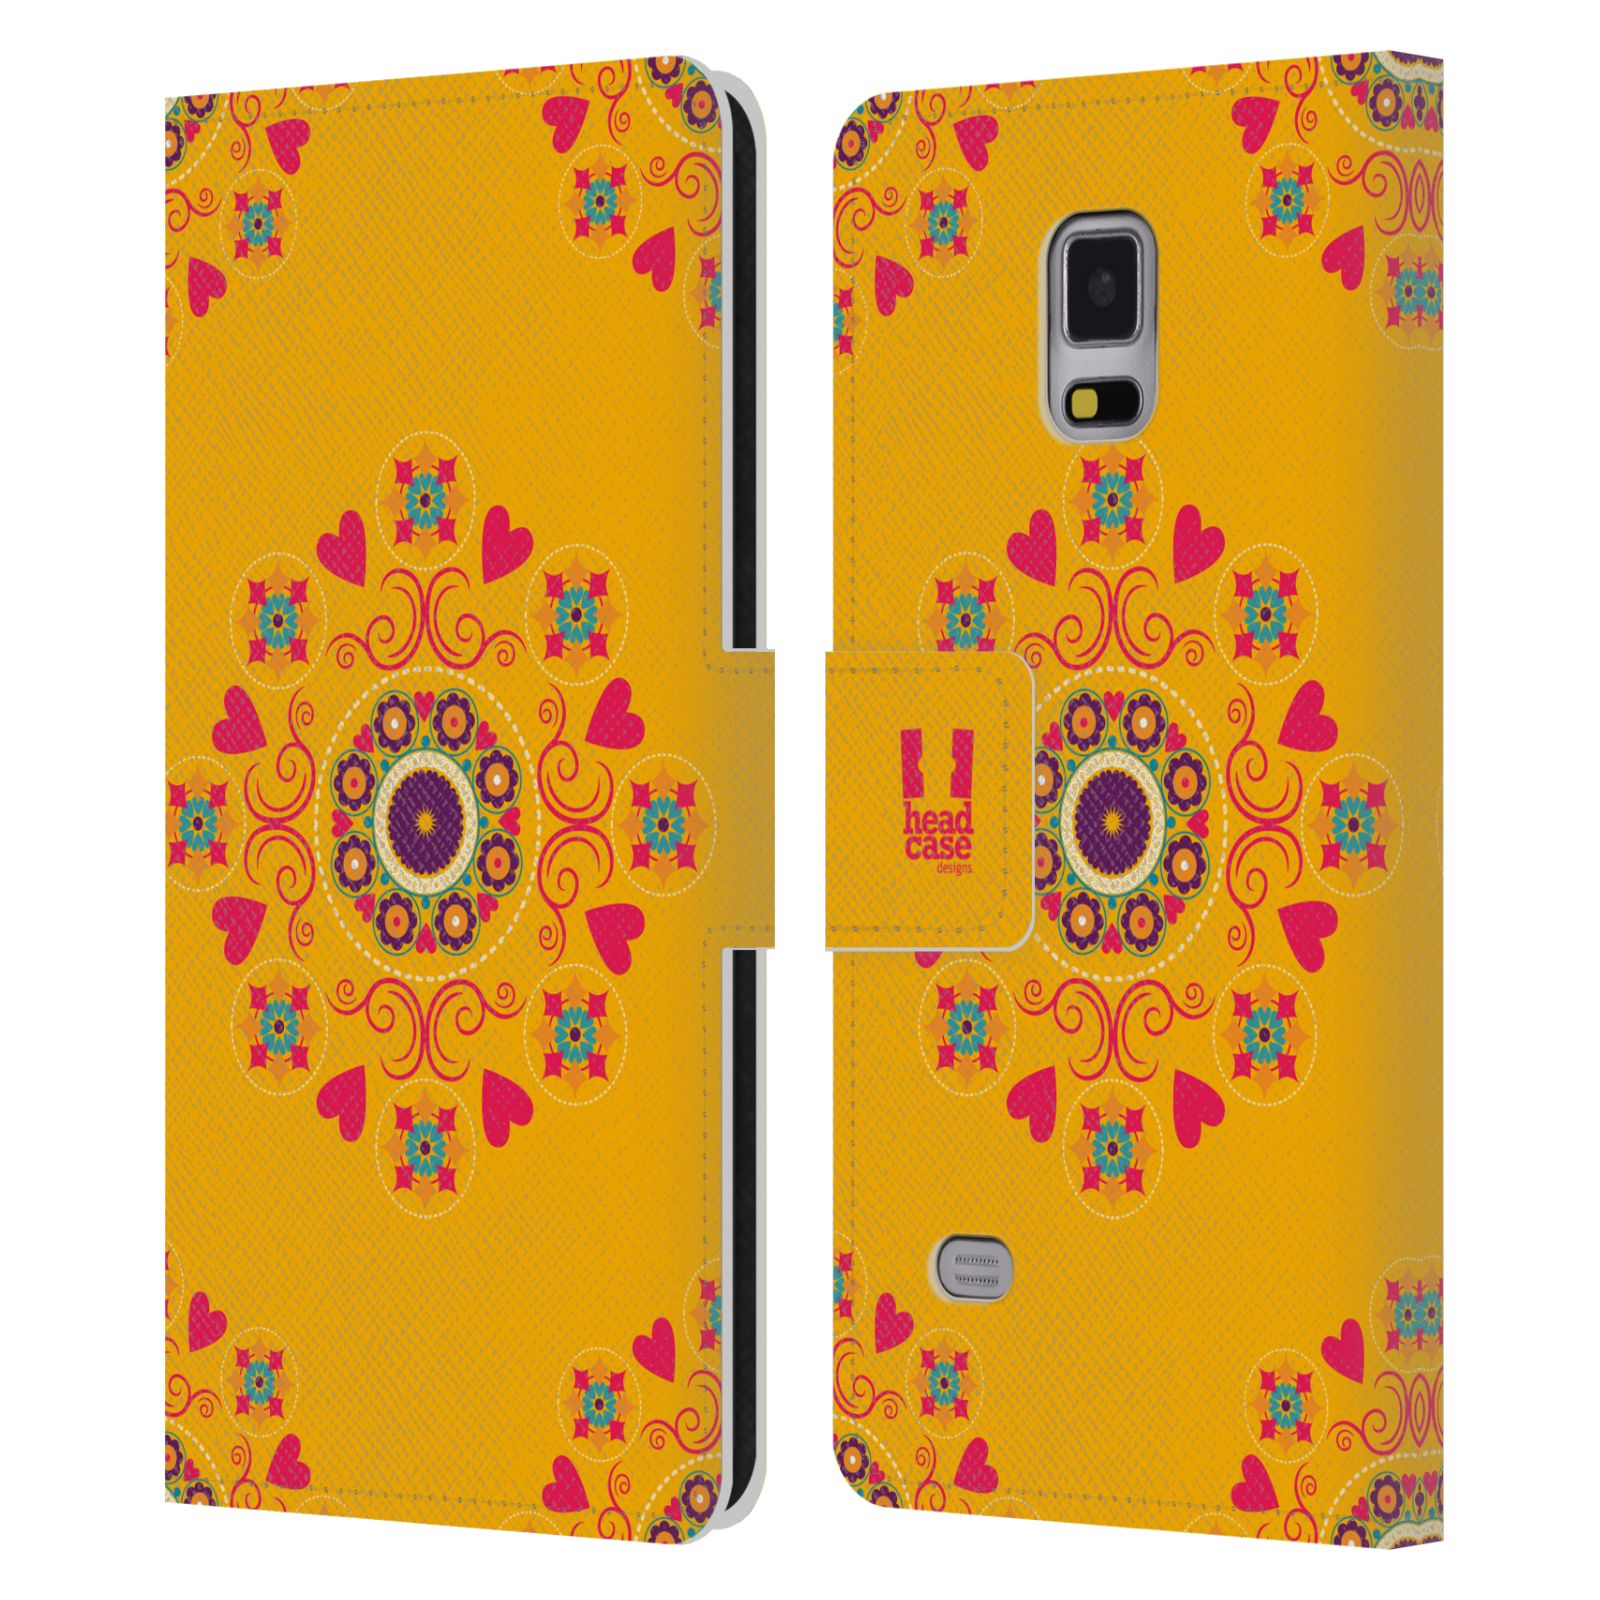 HEAD CASE Flipové pouzdro pro mobil Samsung Galaxy Note 4 Slovanský vzor květiny a srdíčka žlutá